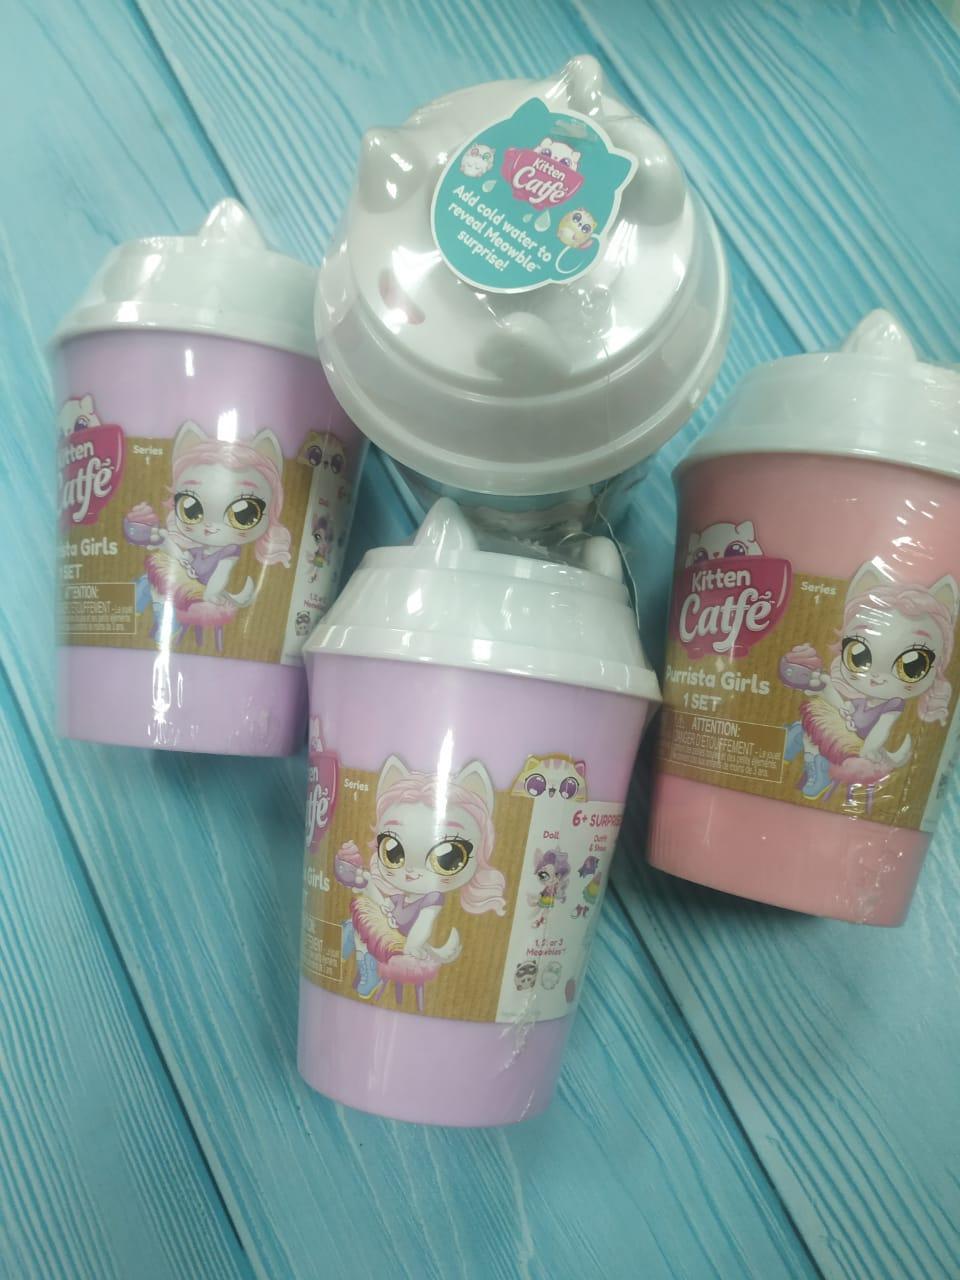 Куклы-кошки Kitten Catfe Purrista Girls Jakks Pacific